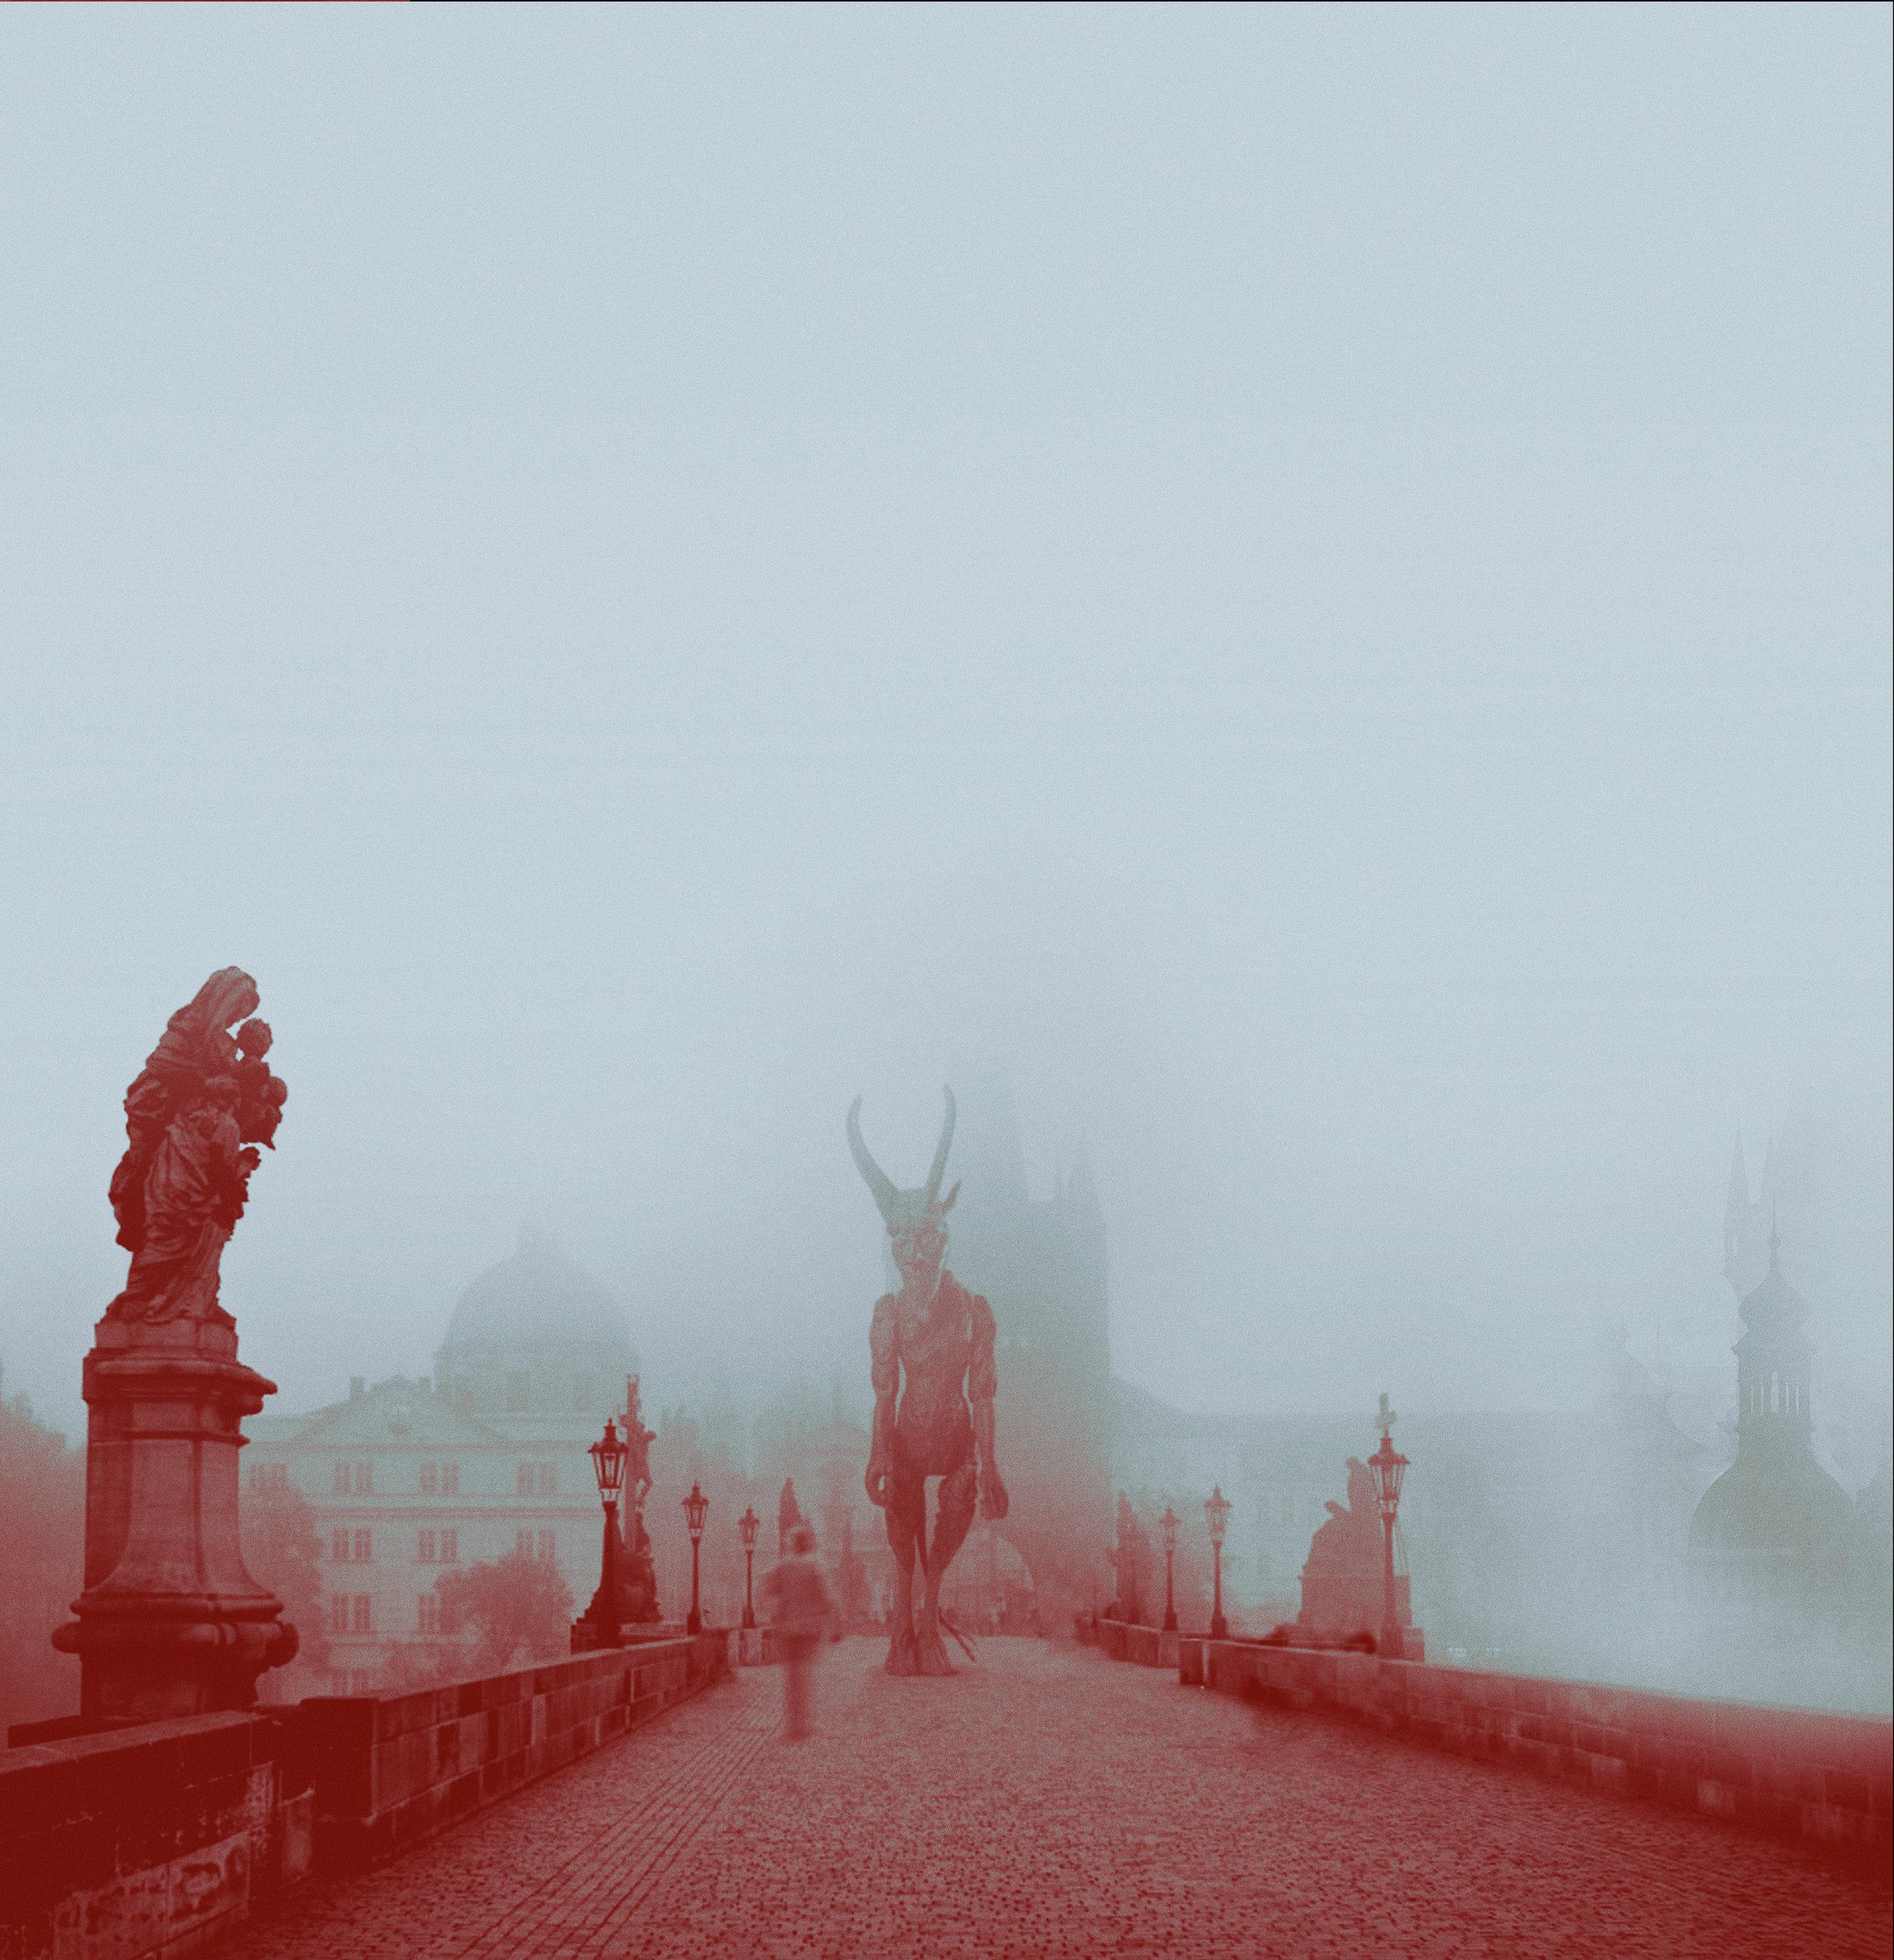 DEVIL'S FAIRGROUND Winter Tour 2018 - The Tiger Lillies will be on tour from Nov 28 to Dec 15, playing songs from their new album Devil's Fairground.Roll up for the final tour of the year!NOV 28 STADTTHEATER - WELS, AUSTRIANOV 29 KABINET MÚZ - BRNO-STŘED, CZECH REPUBLICNOV 30 DÜRER MUSIC CLUB - BUDAPEST, HUNGARYDEC 3 DOM OMLADINE - BELGRADE, SERBIADEC 5 KONZERTHAUS SCHÜÜR - LUZERN, SWITZERLANDDEC 6 ATLANTIS - BASEL, SWITZERLANDDEC 7 MOODS - ZURICH, SWITZERLANDDEC 9 MUSIC HALL - INNSBRUCK, AUSTRIADEC 10 KINO ŠIŠKA CENTRE FOR URBAN CULTURE - LJUBLJANA, SLOVENIADEC 12 GUGG - BRAUNAU AM INN, AUSTRIADEC 13 ROCKHOUSE - SALZBURG, AUSTRIADEC 14/15 PORGY & BESS - VIENNA, AUSTRIATICKETS